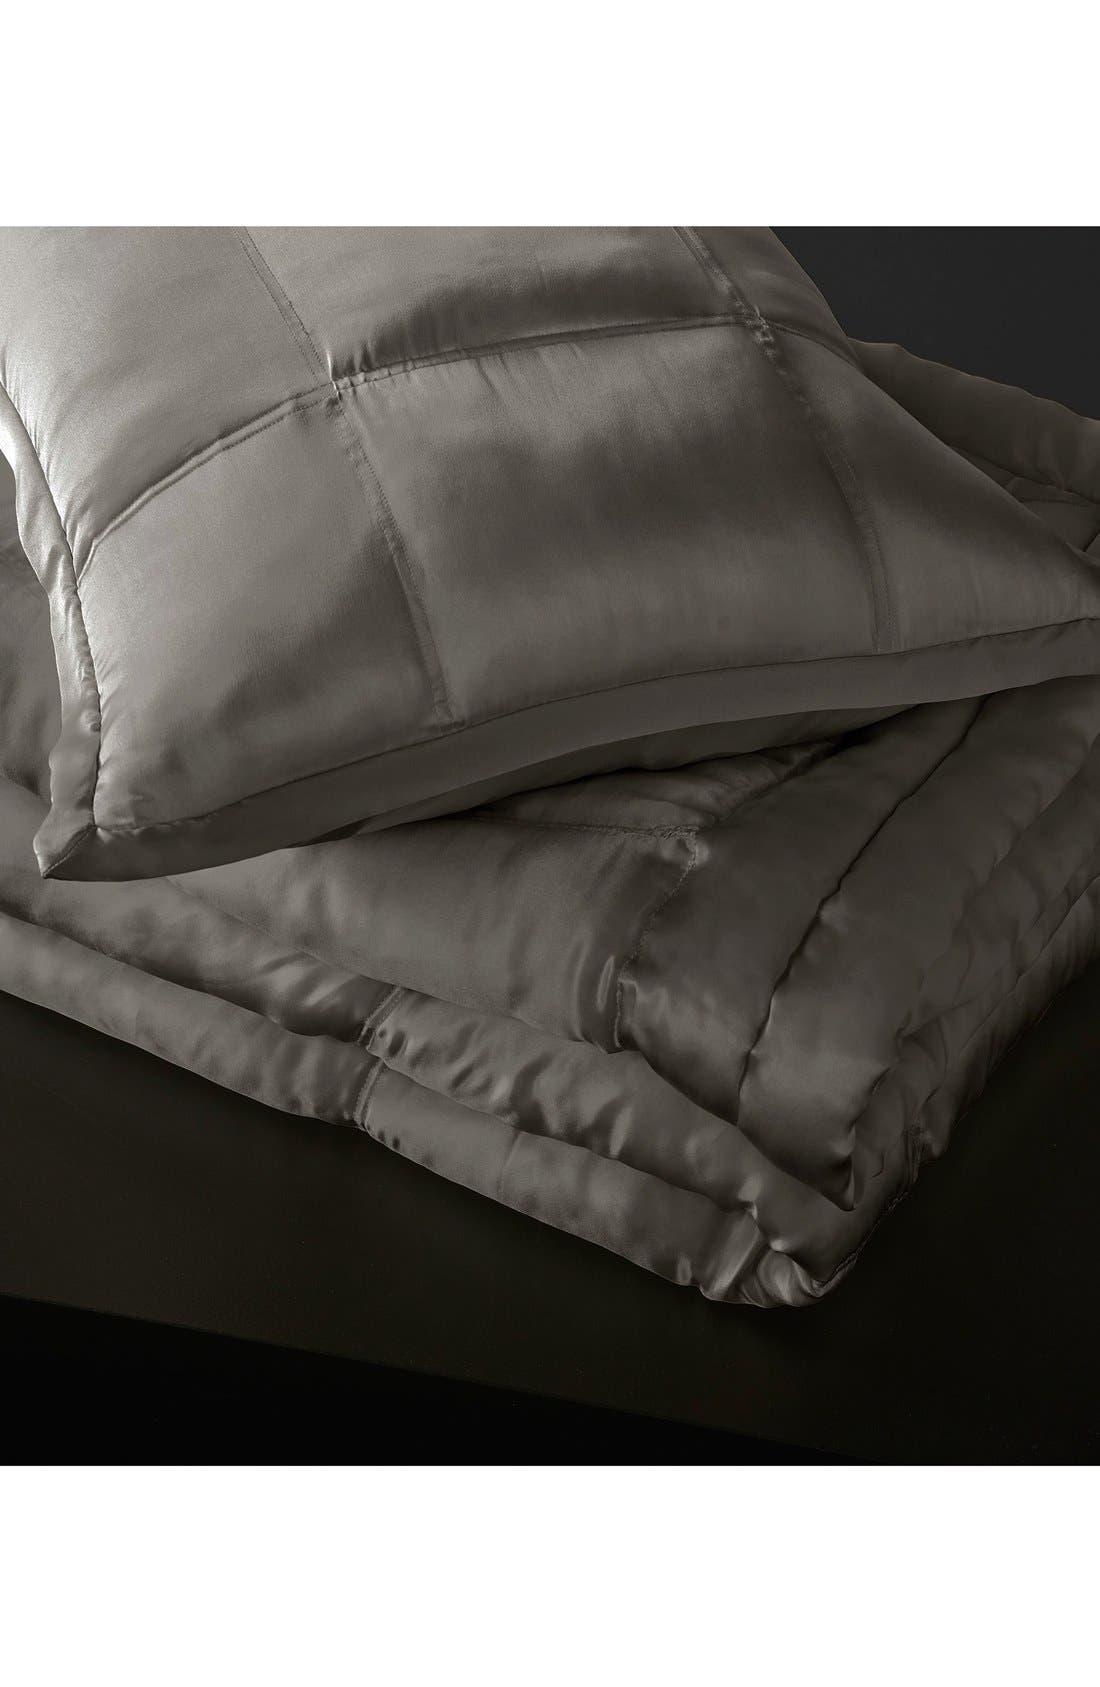 DONNA KARAN NEW YORK, Donna Karan Collection 'Surface' Silk Charmeuse Quilt, Main thumbnail 1, color, CHARCOAL